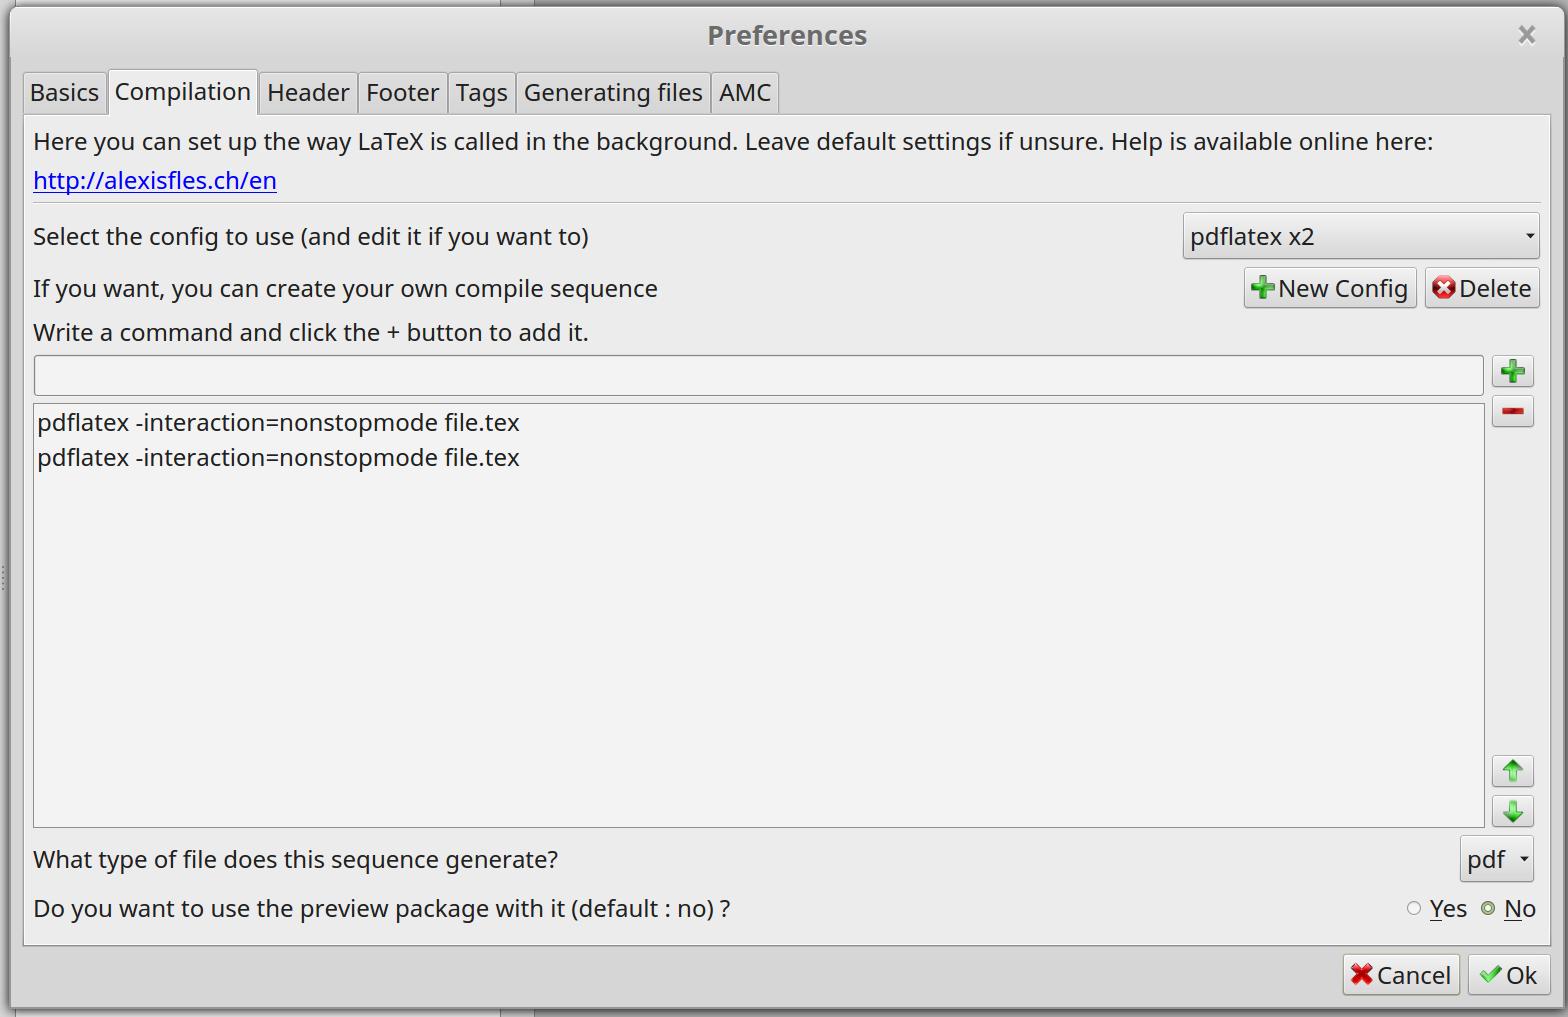 BASIC TEX PDFLATEX PDF DOWNLOAD